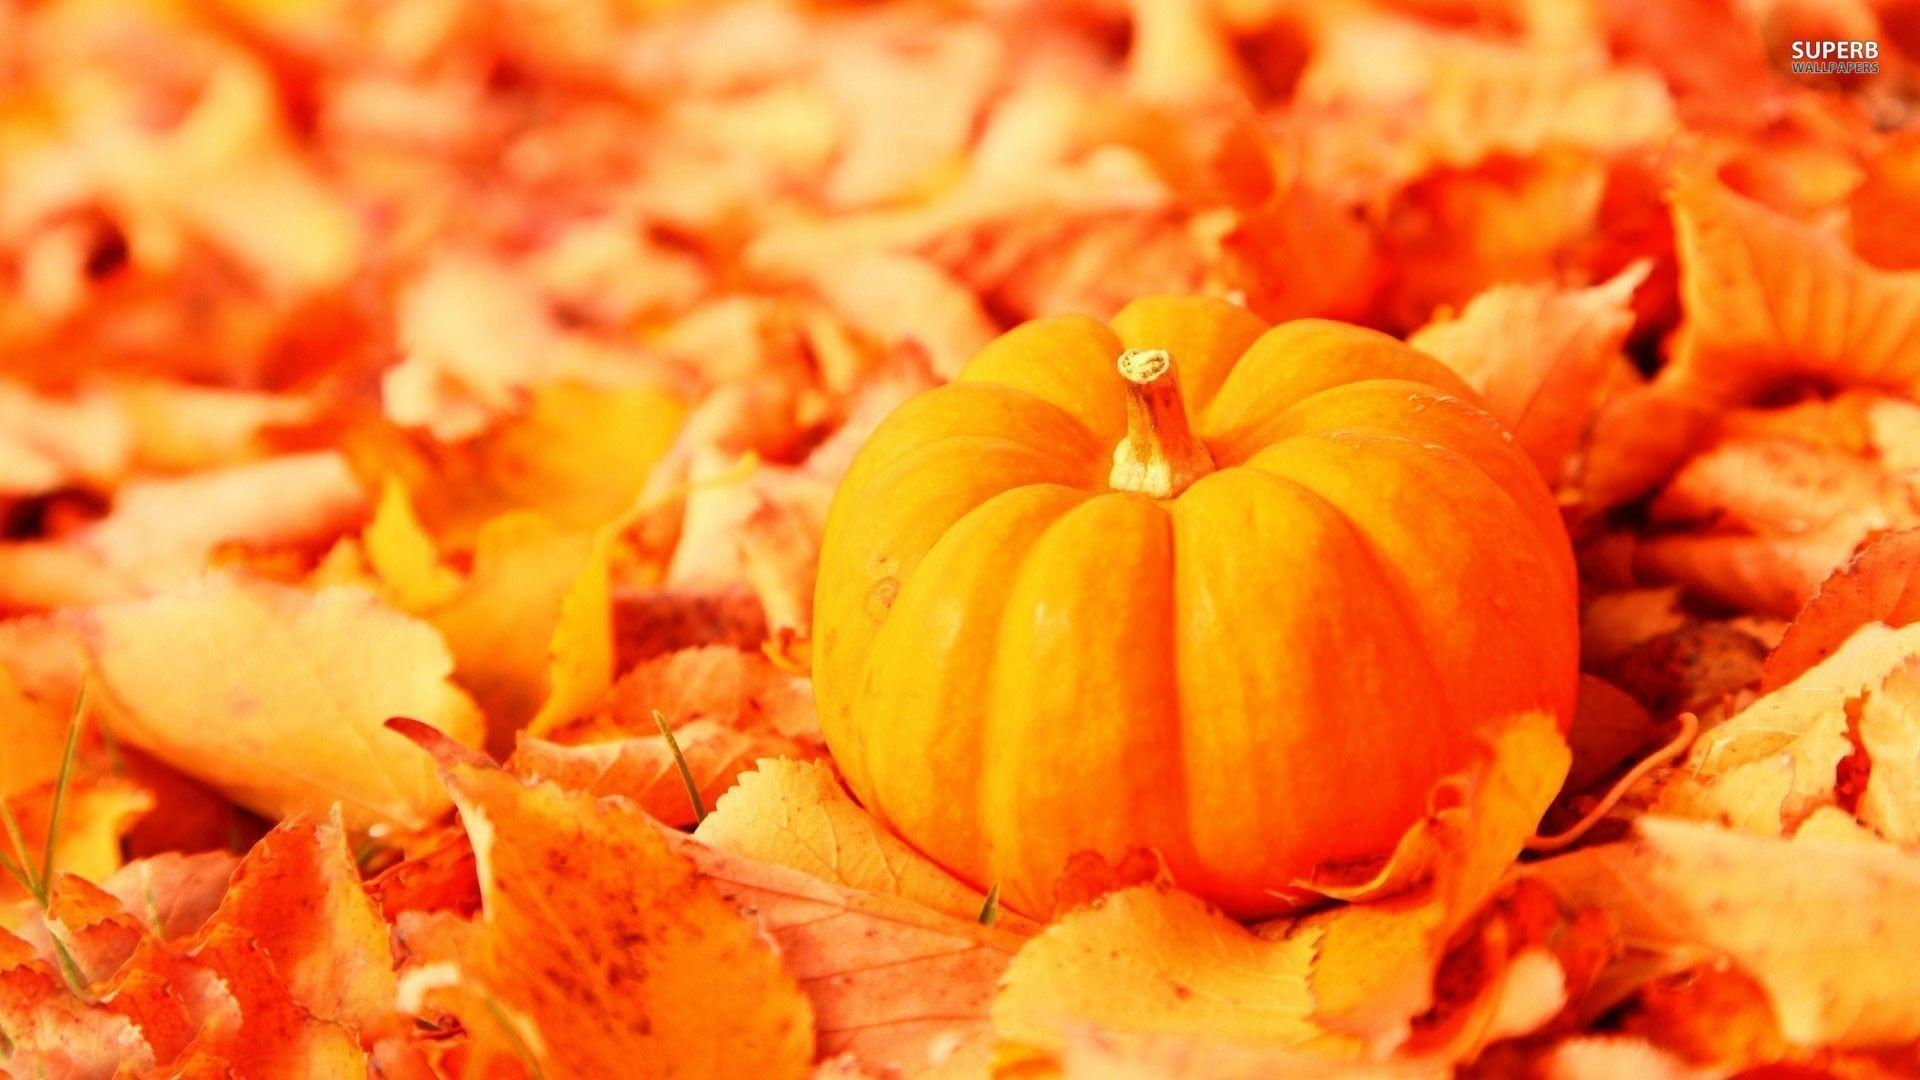 Pumpkin wallpapers wallpaper cave - Fall wallpaper pumpkins ...